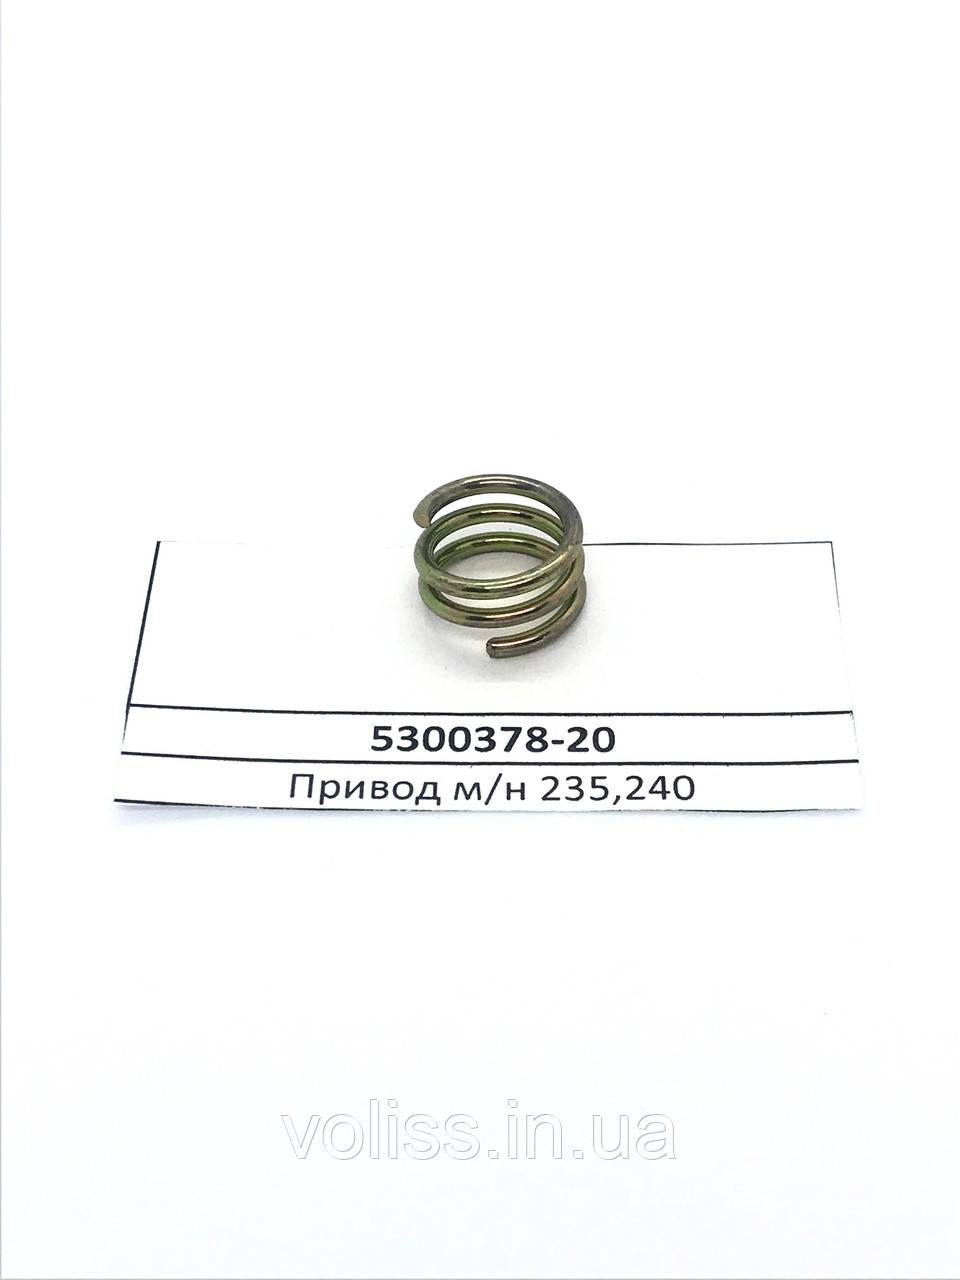 Привід маслонасоса бензопили Husqvarna 236, 240 (5300378-20)